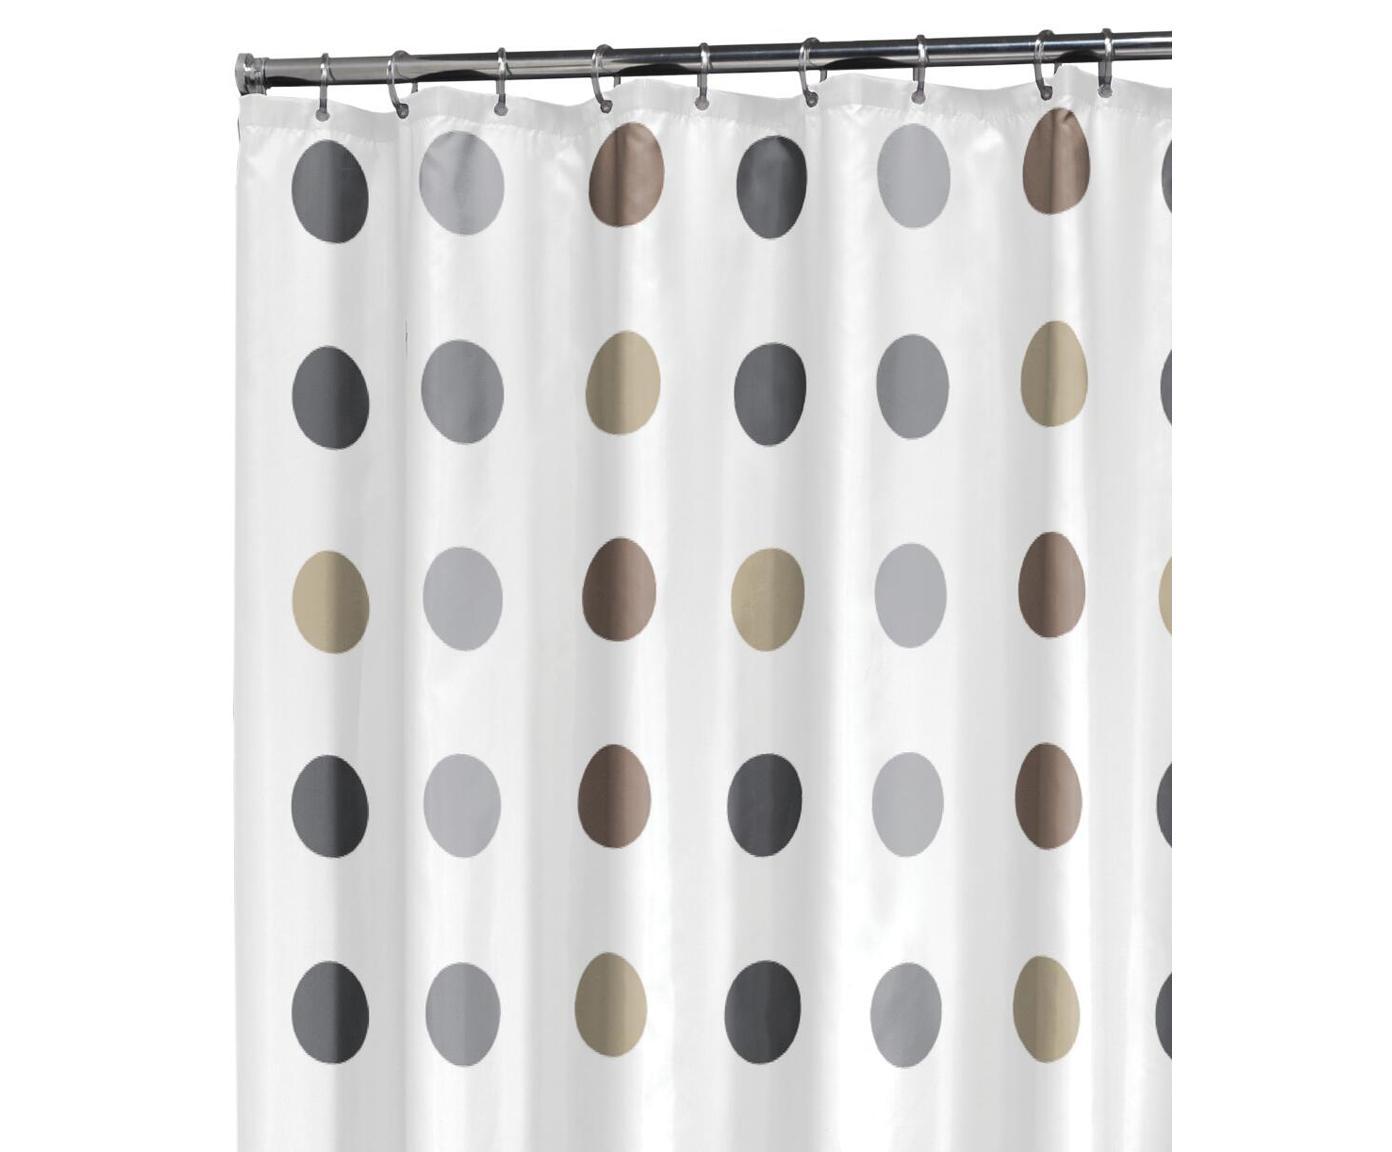 Douchegordijn Twister, Polyester Waterafstotend, niet waterdicht, Wit, beige, taupe, grijs, 180 x 200 cm